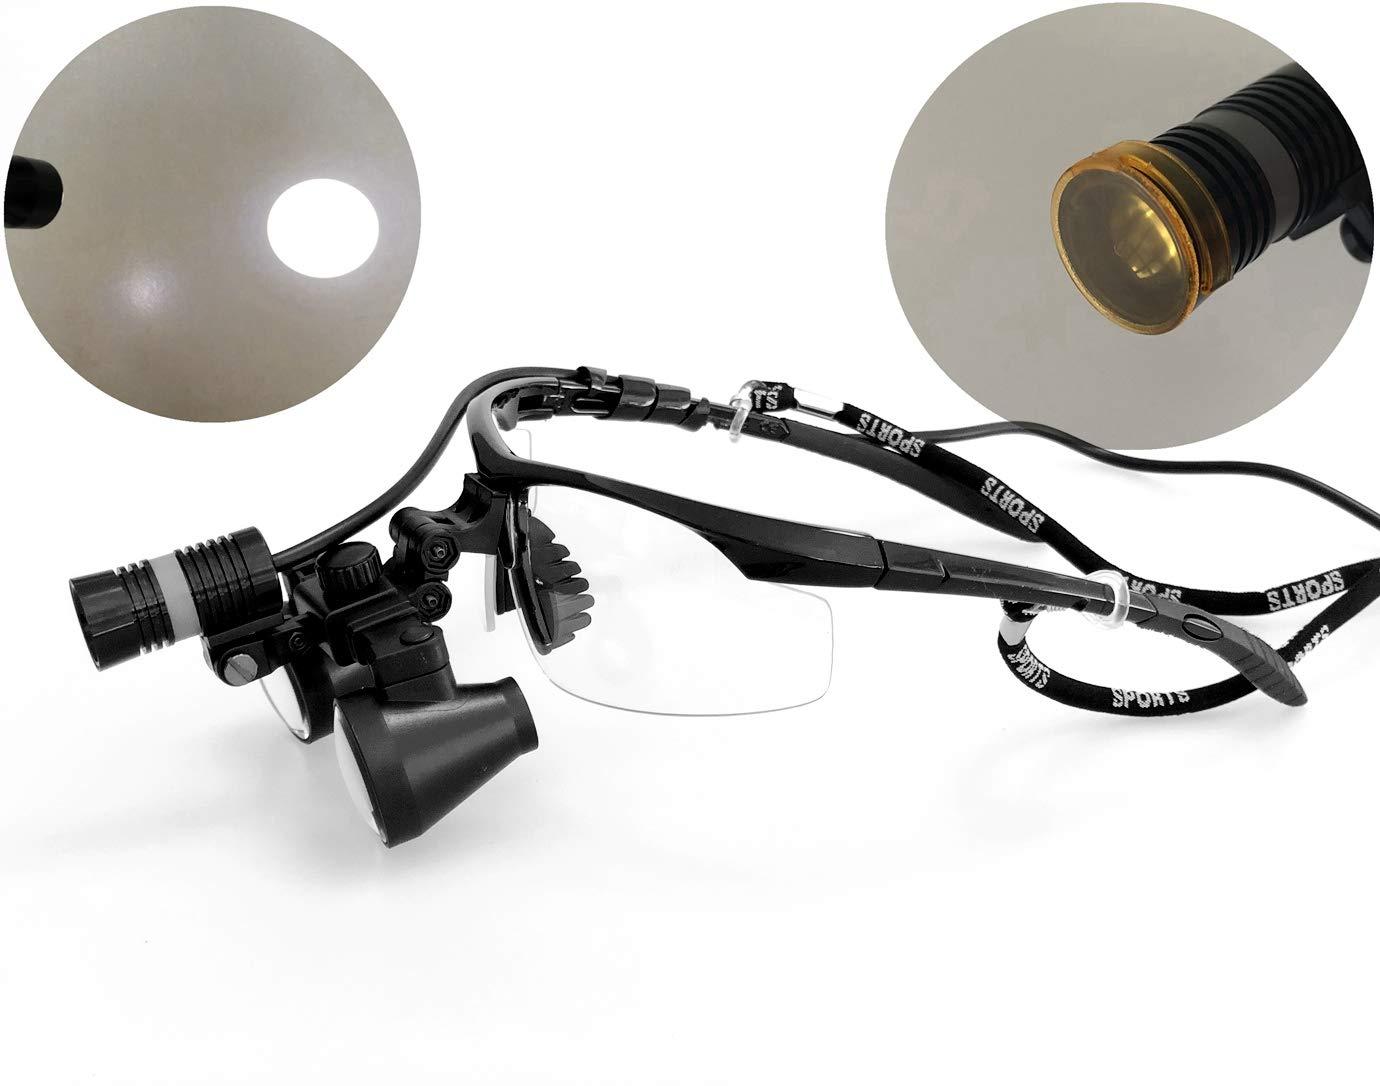 Songzi Optics 2.5X 3X 3.5X ! Super beauty product restock quality top! Spasm price Black Dent Optional Goggles Binocular